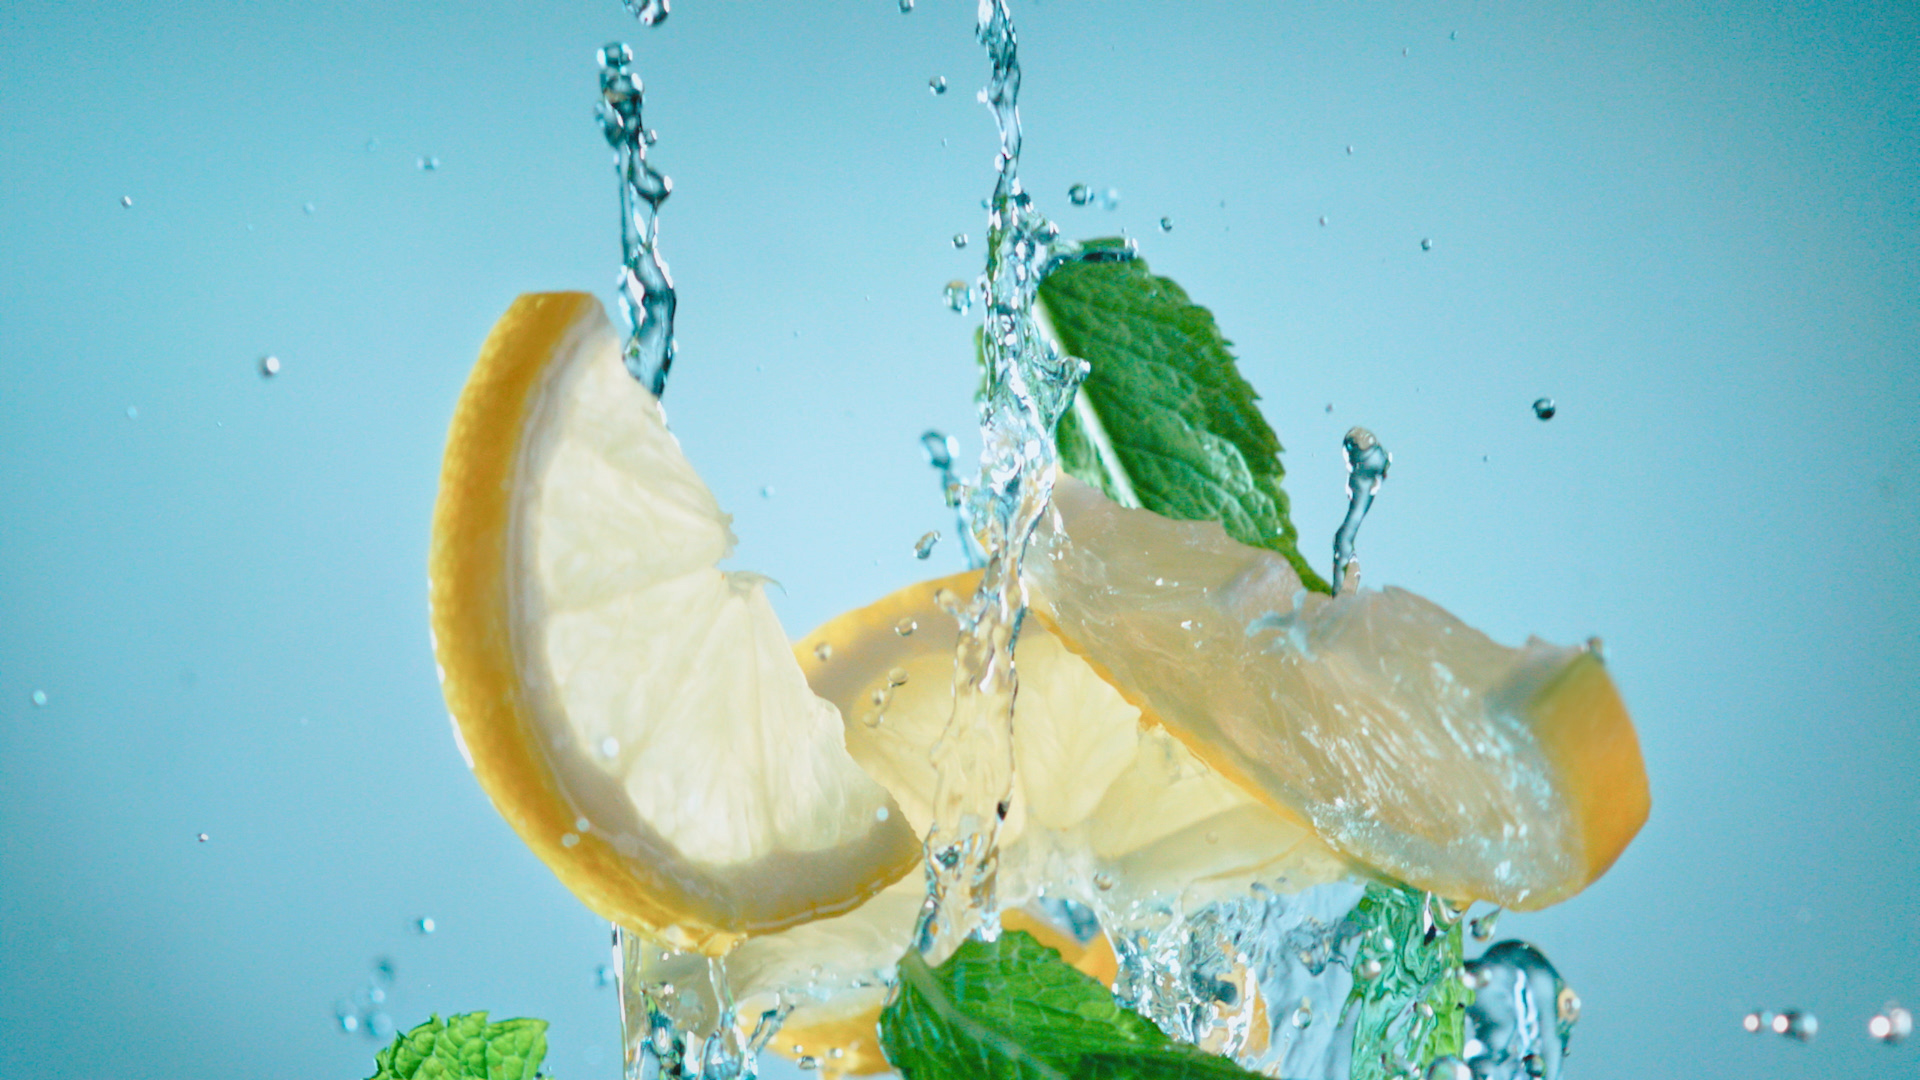 portfolio/dobry-water-juice/dobry_waterjuice_jorrit-stollman_06.jpg